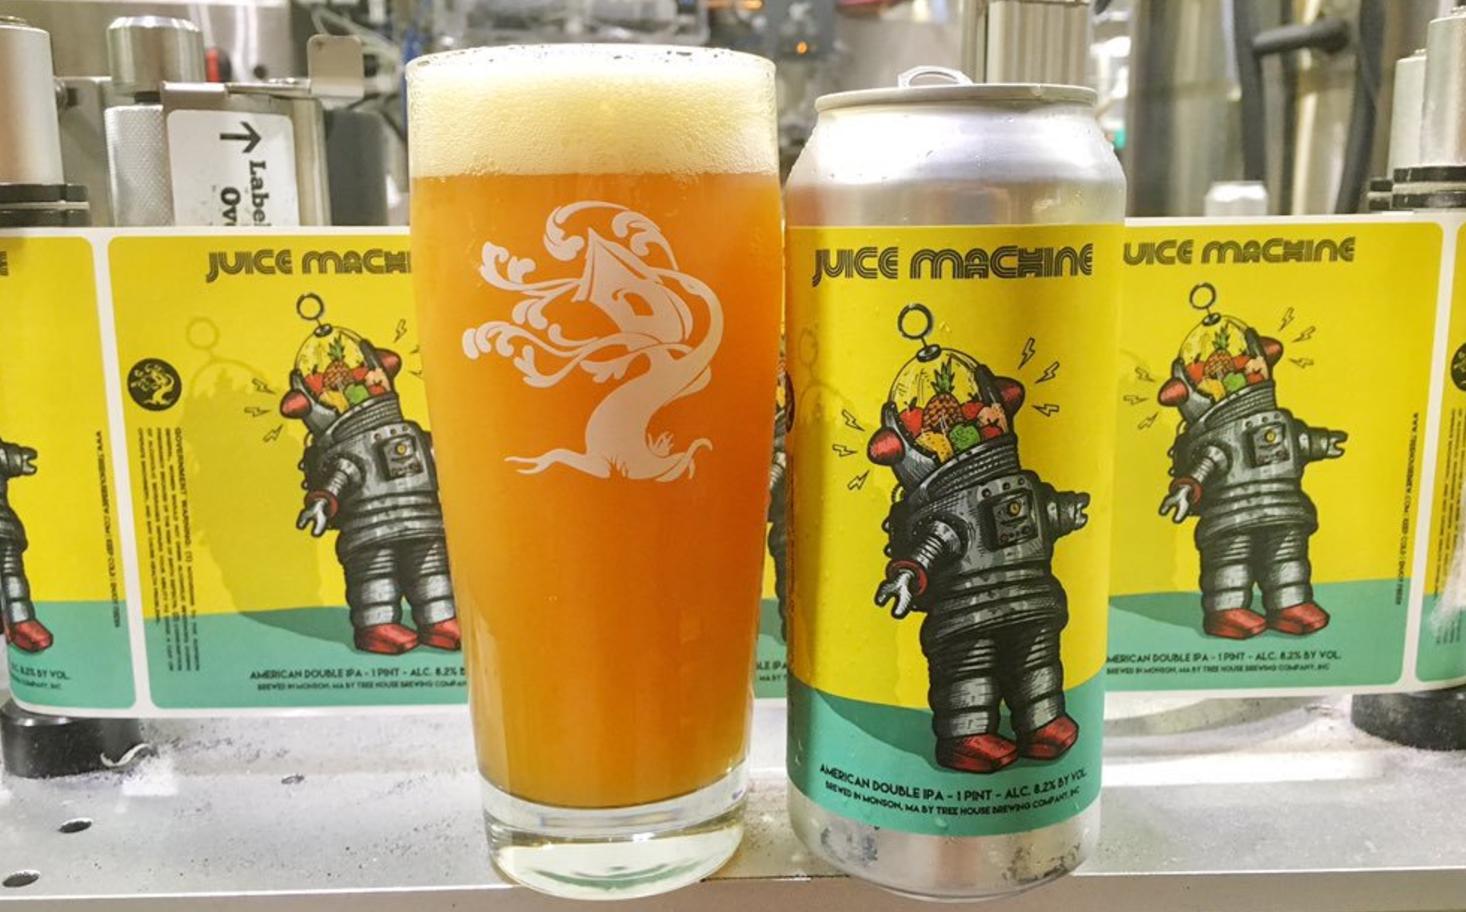 Juice Machine - great beer and artwork.